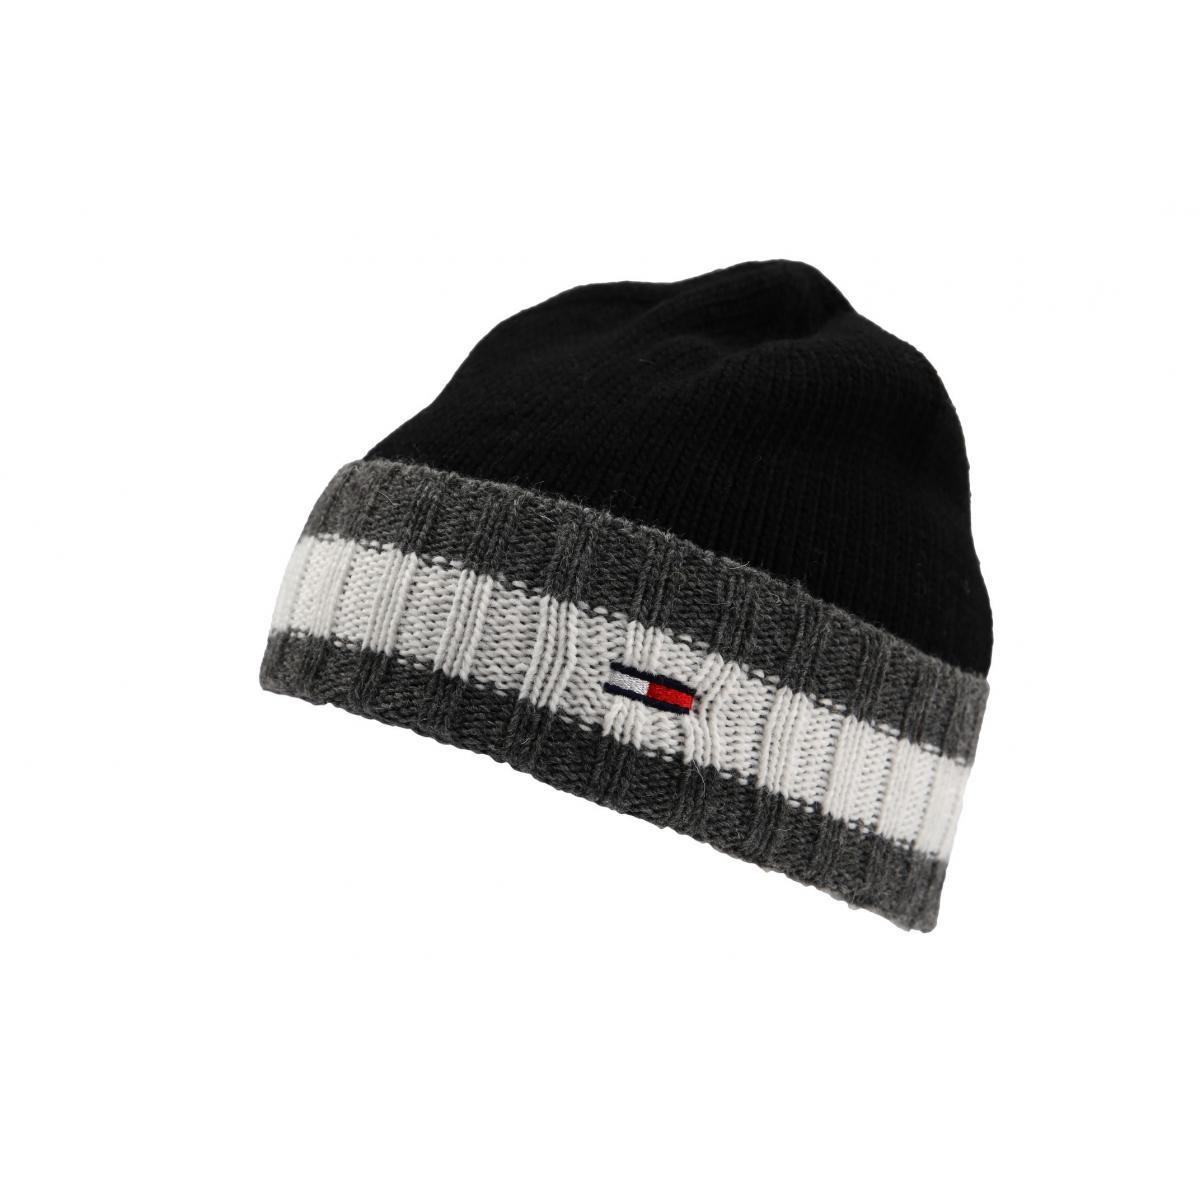 Cappello Tommy Hilfiger Corporate con logo unisex rif. AM0AM03973